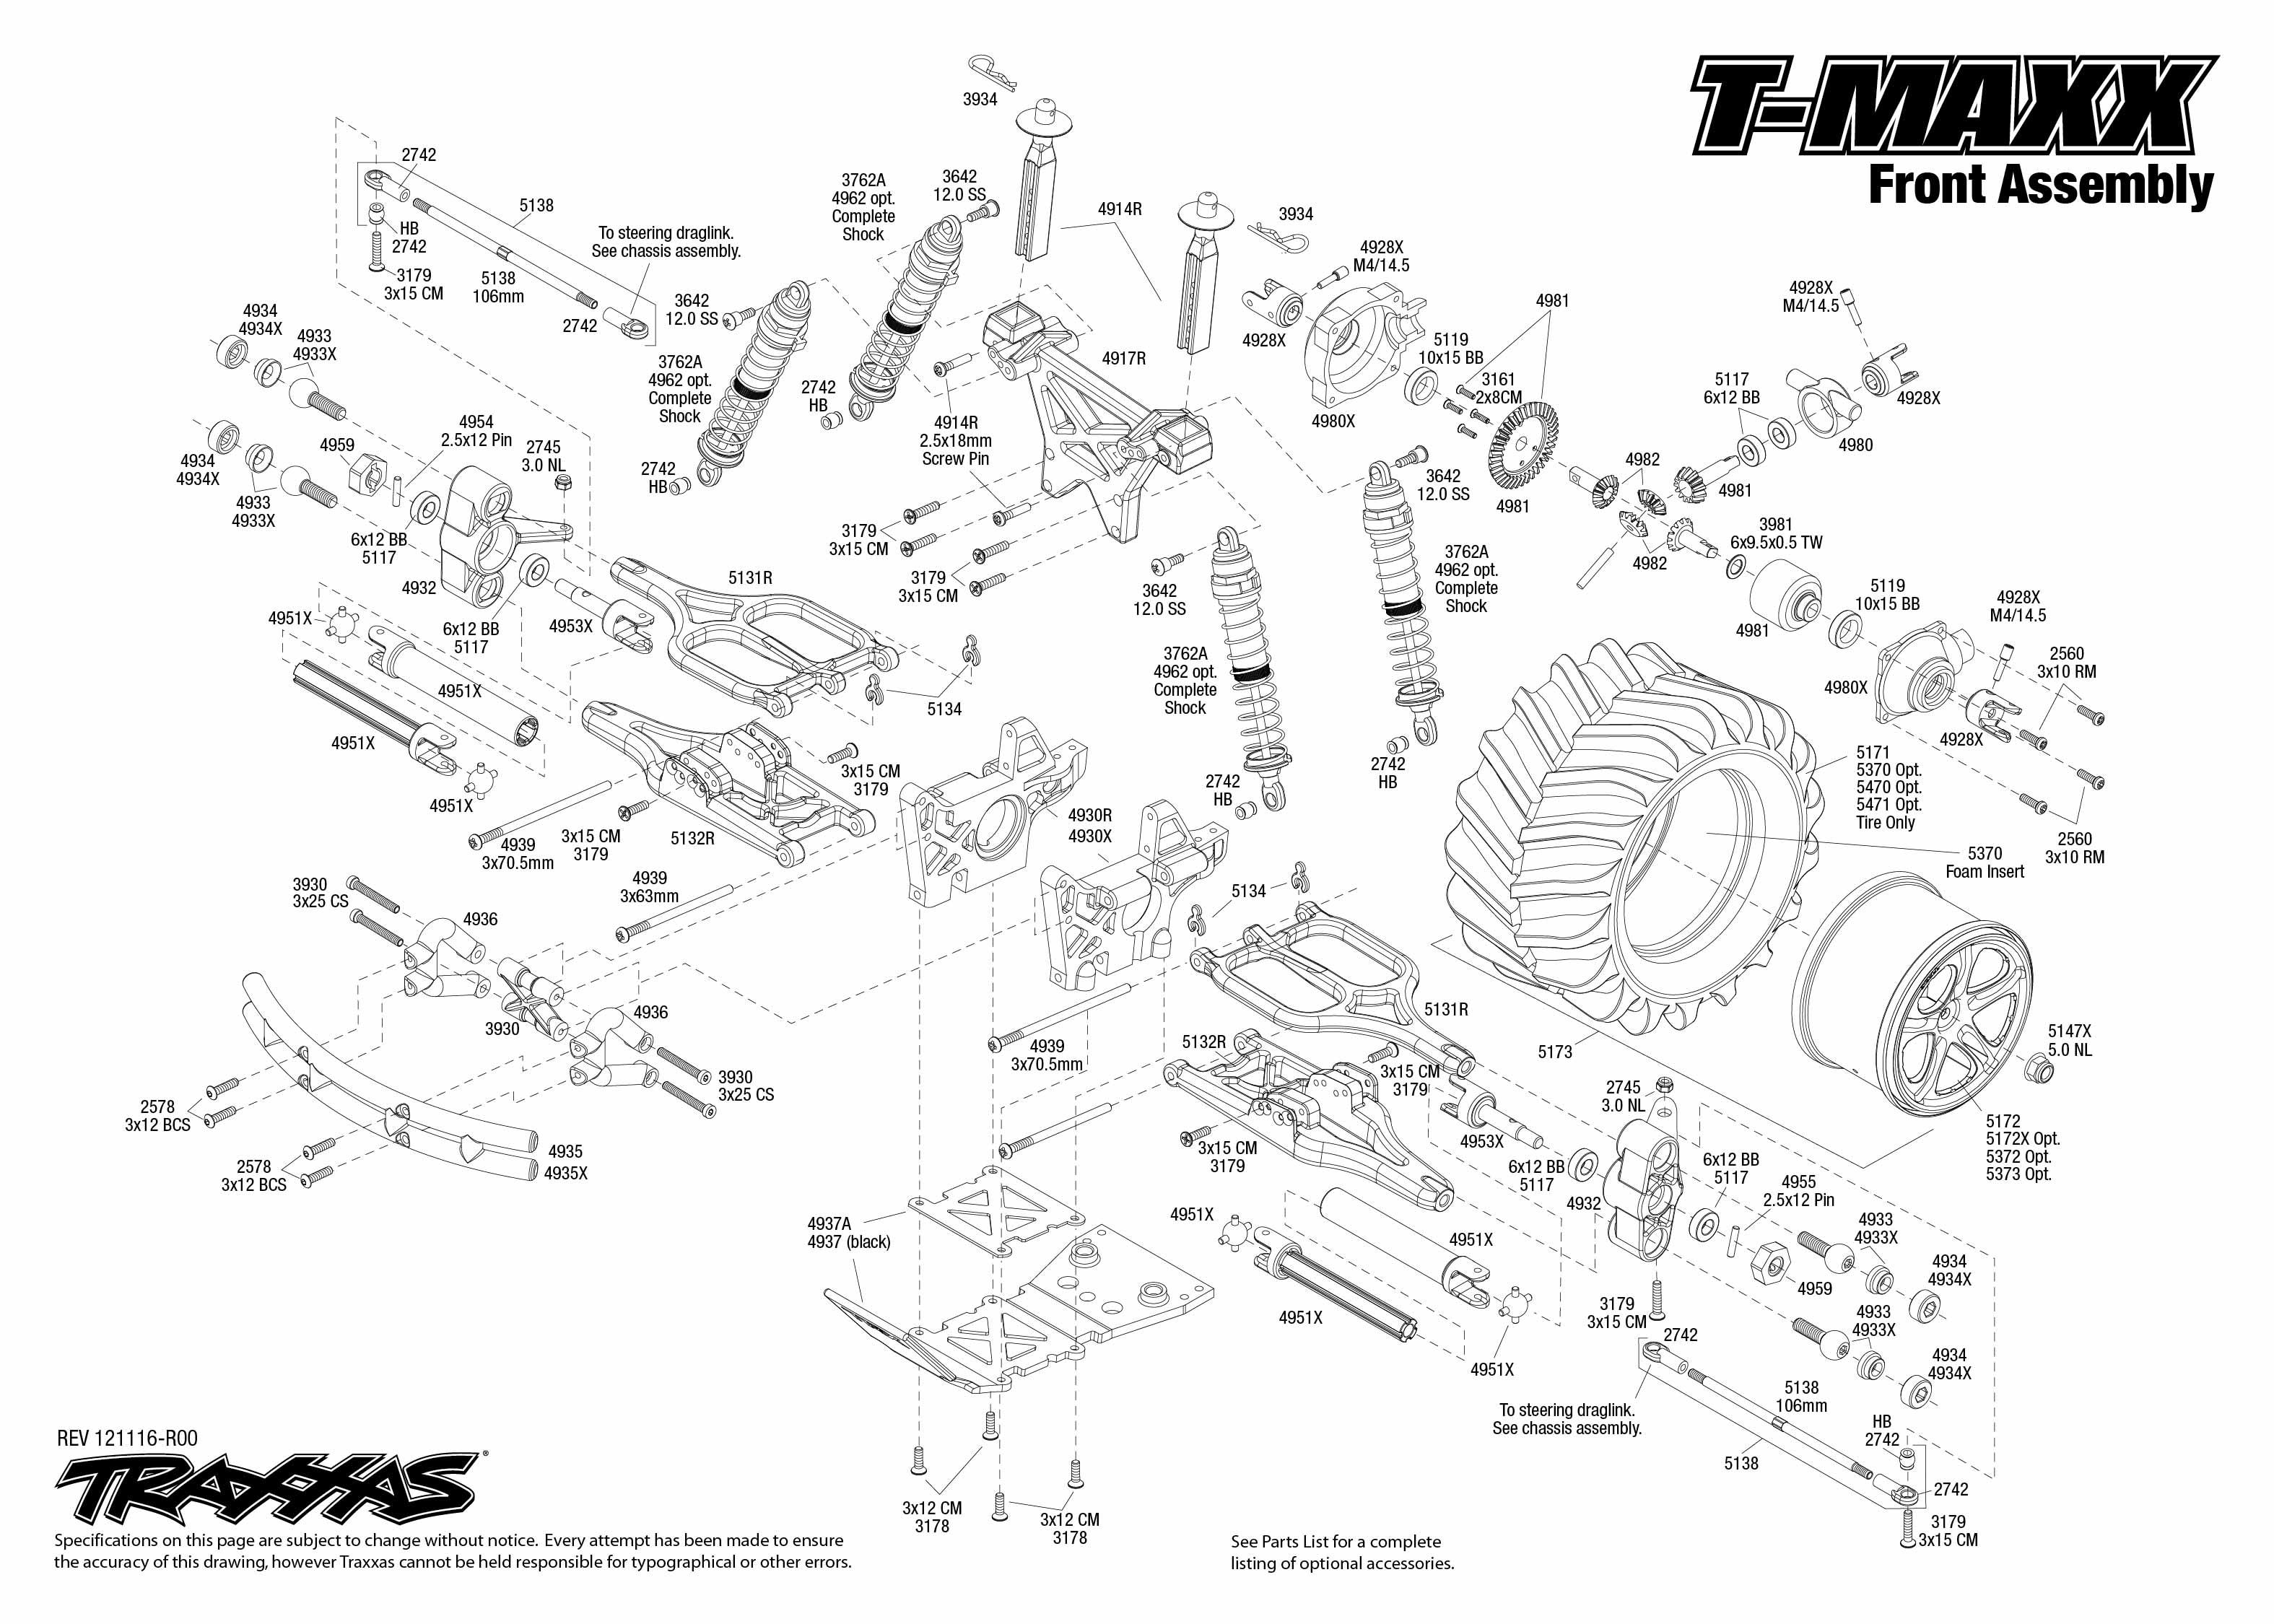 traxxas revo 3 parts diagram 120v motor wiring 49104 front assembly |